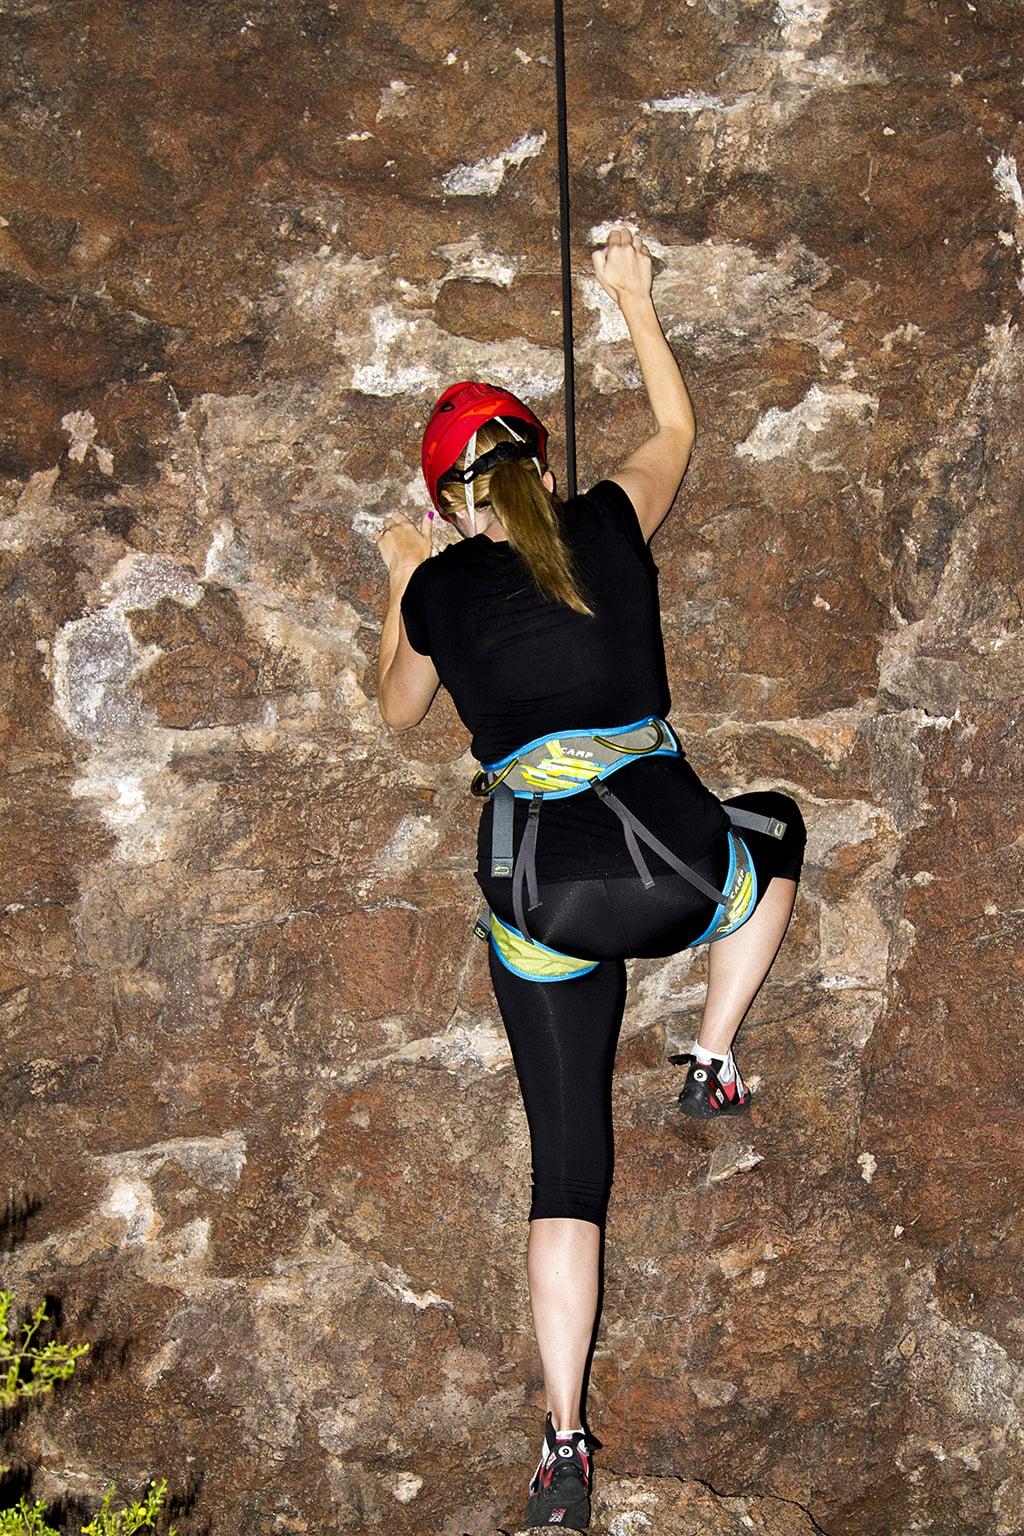 rocking climbing gear